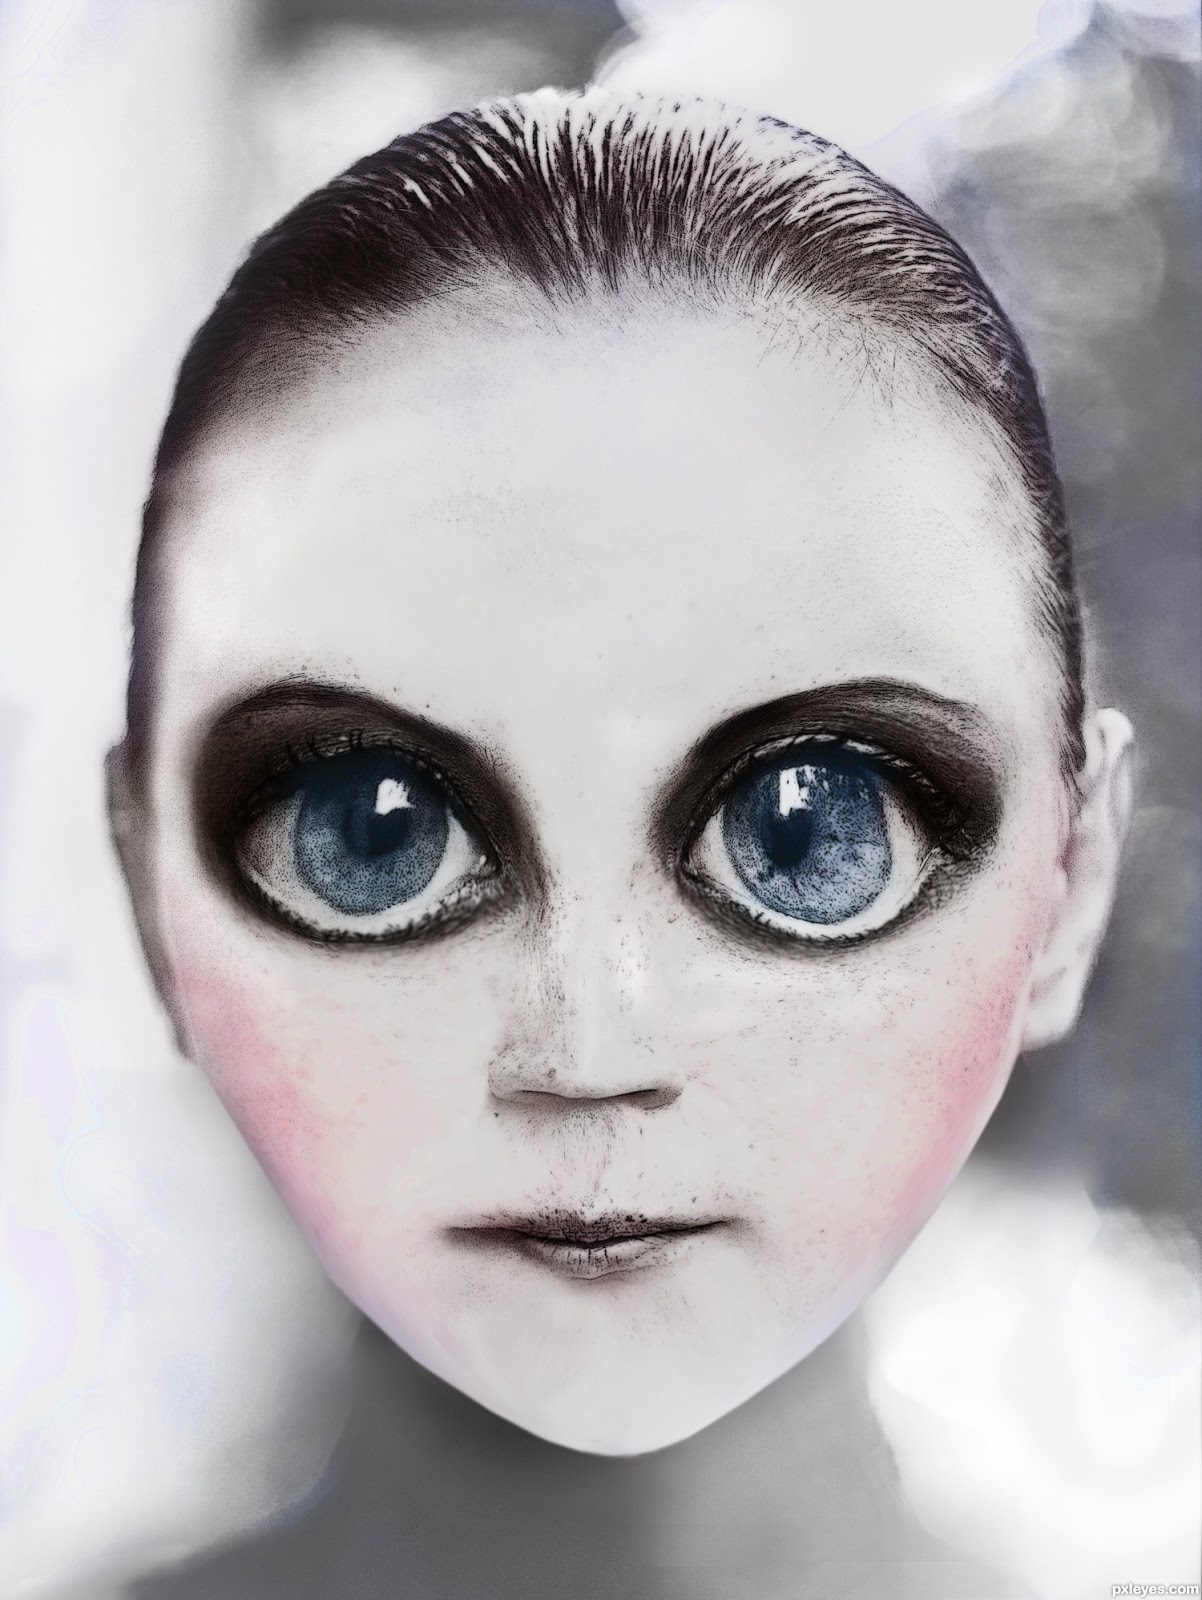 Heath Lowrance: Looking Them In The Eyes